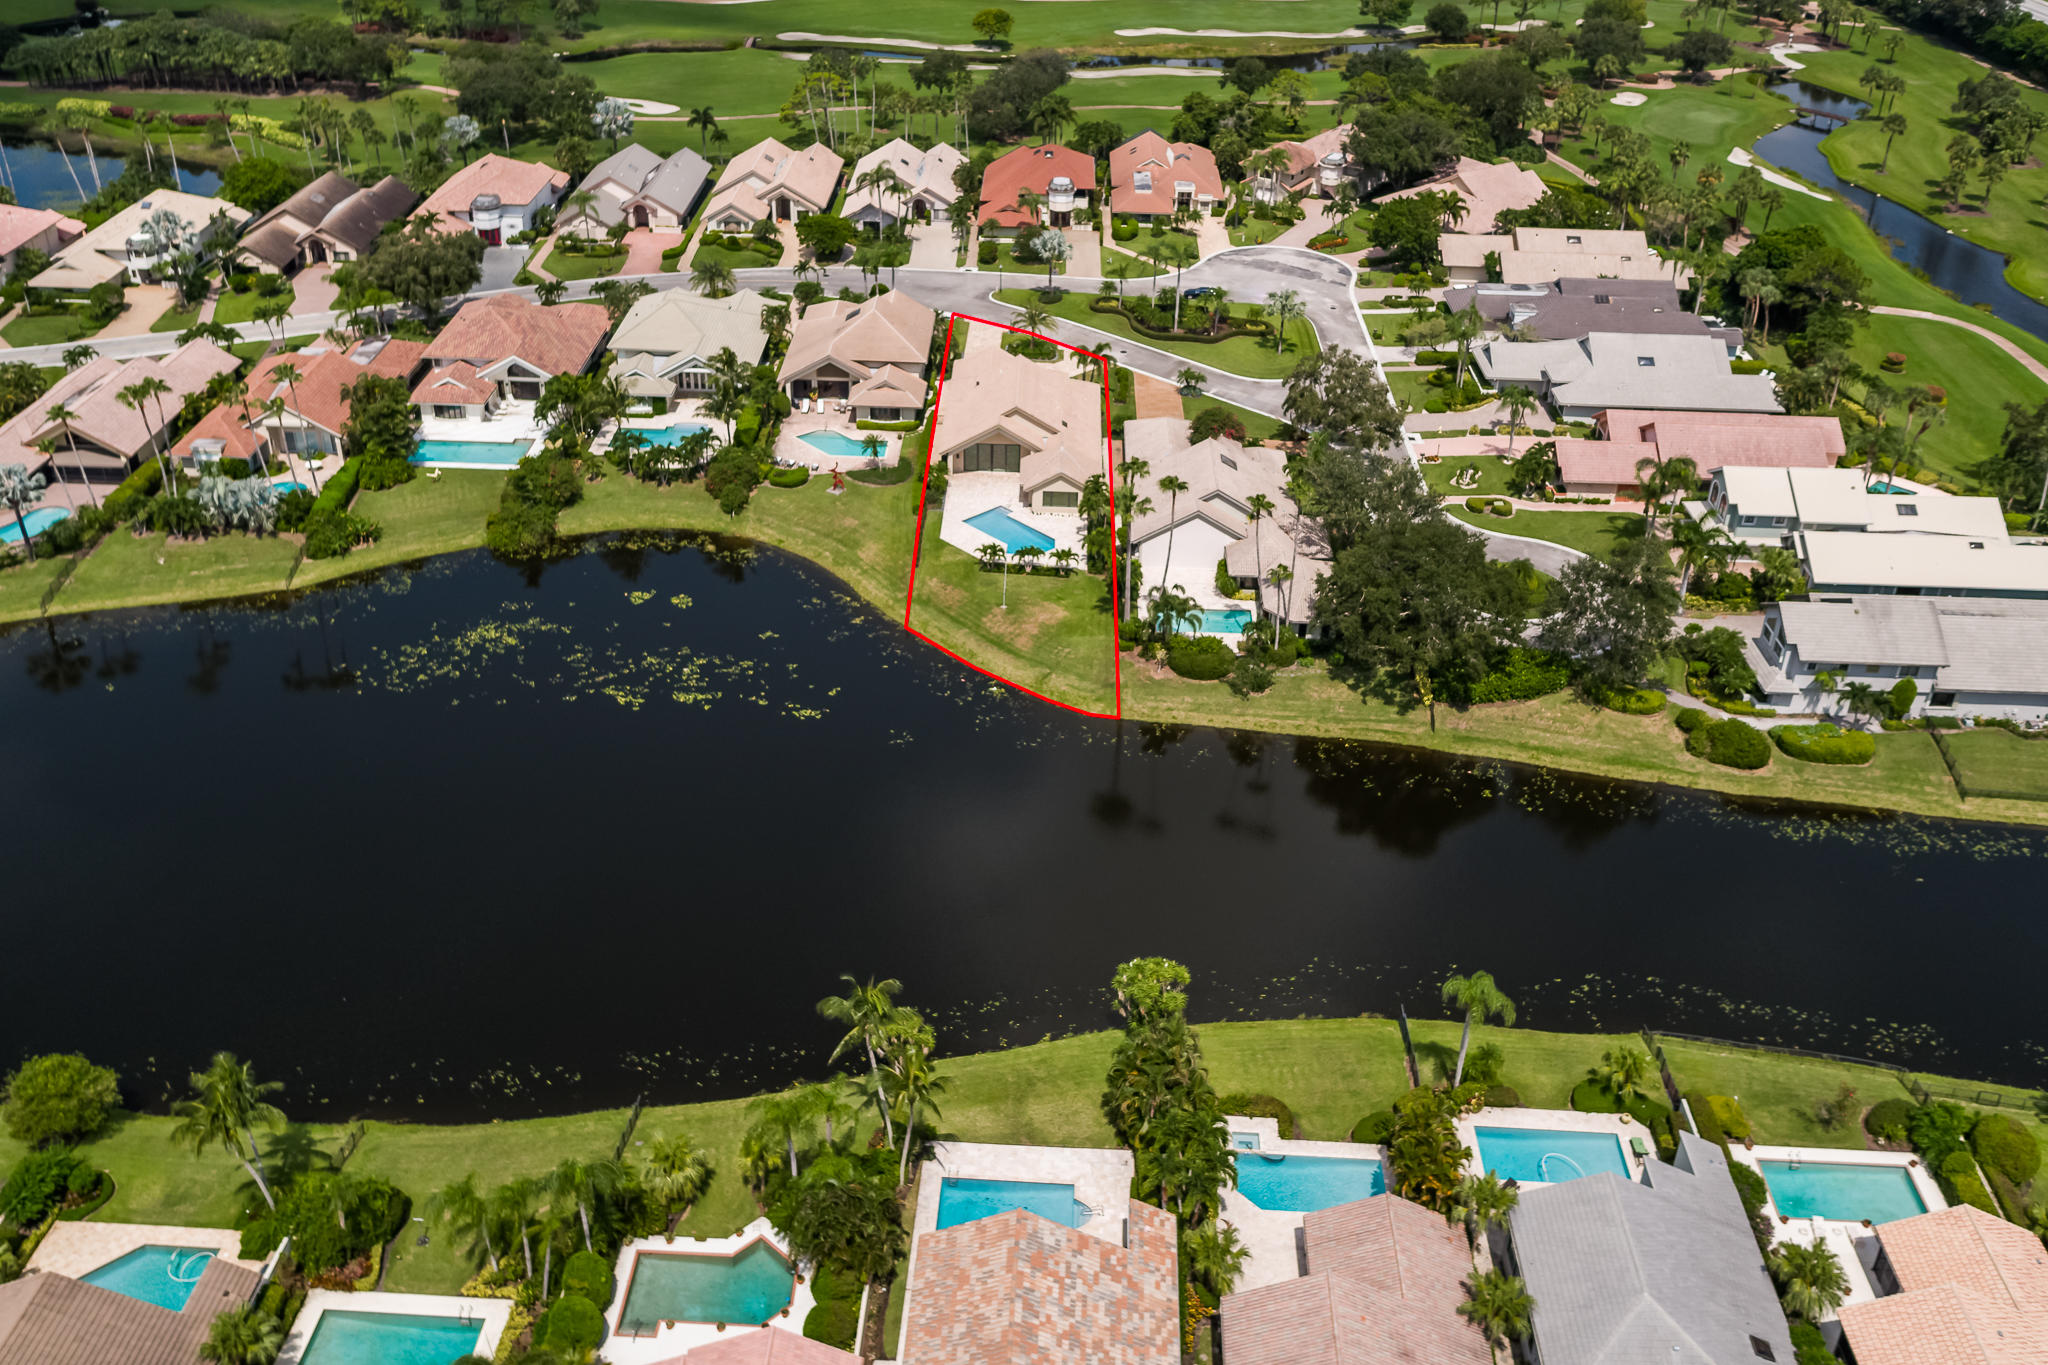 13828 Rivoli Drive, Palm Beach Gardens, Florida 33410, 3 Bedrooms Bedrooms, ,4.1 BathroomsBathrooms,A,Single family,Rivoli,RX-10452484